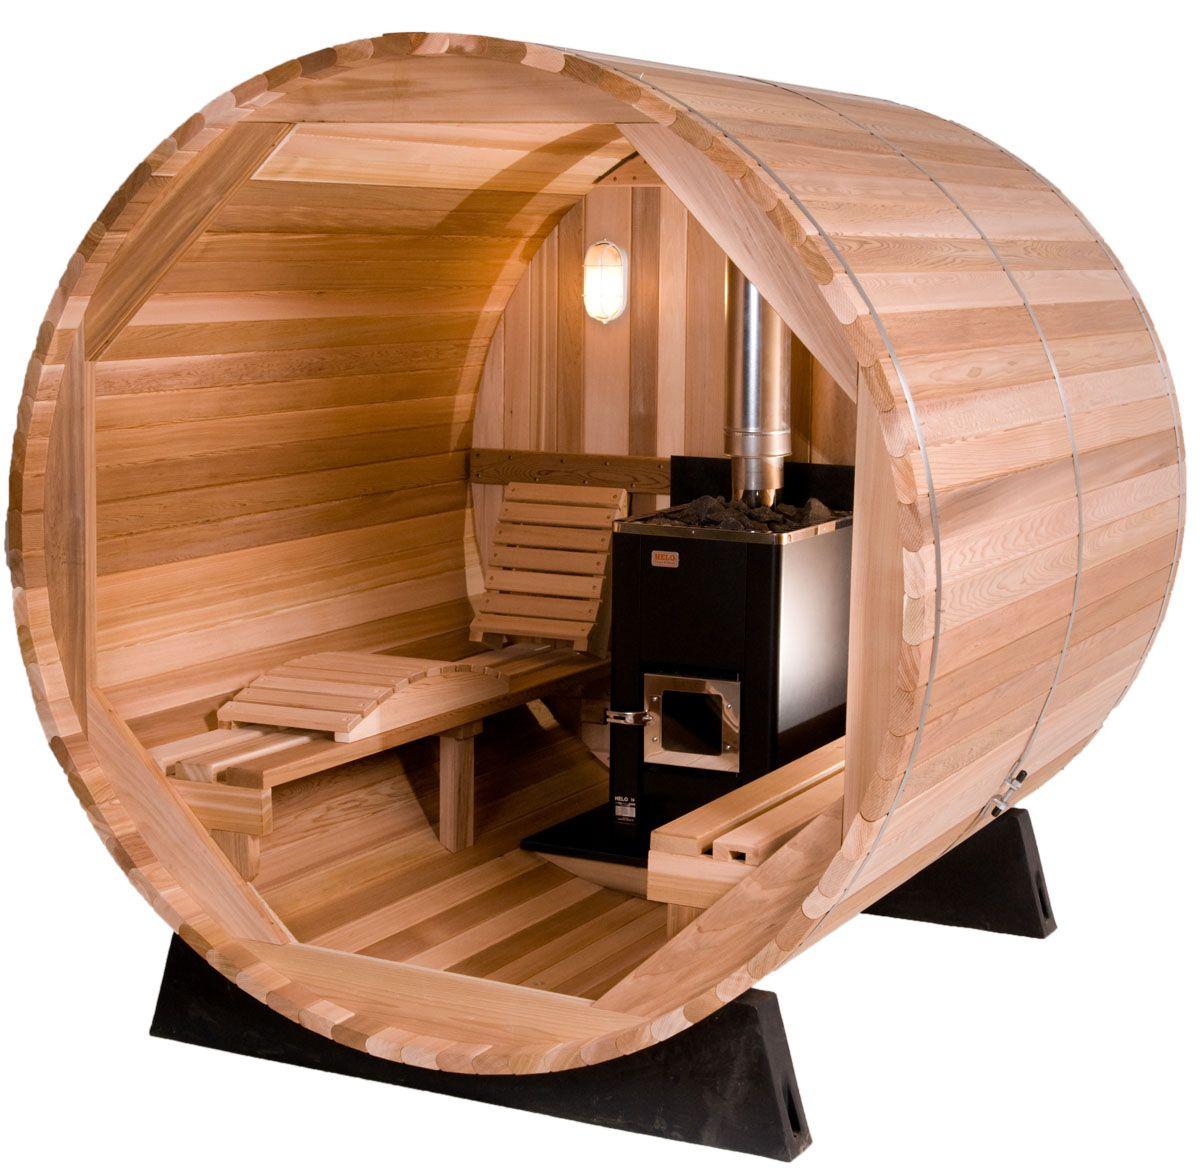 Wood-burning Options Wooden Saunas Barrel Sauna